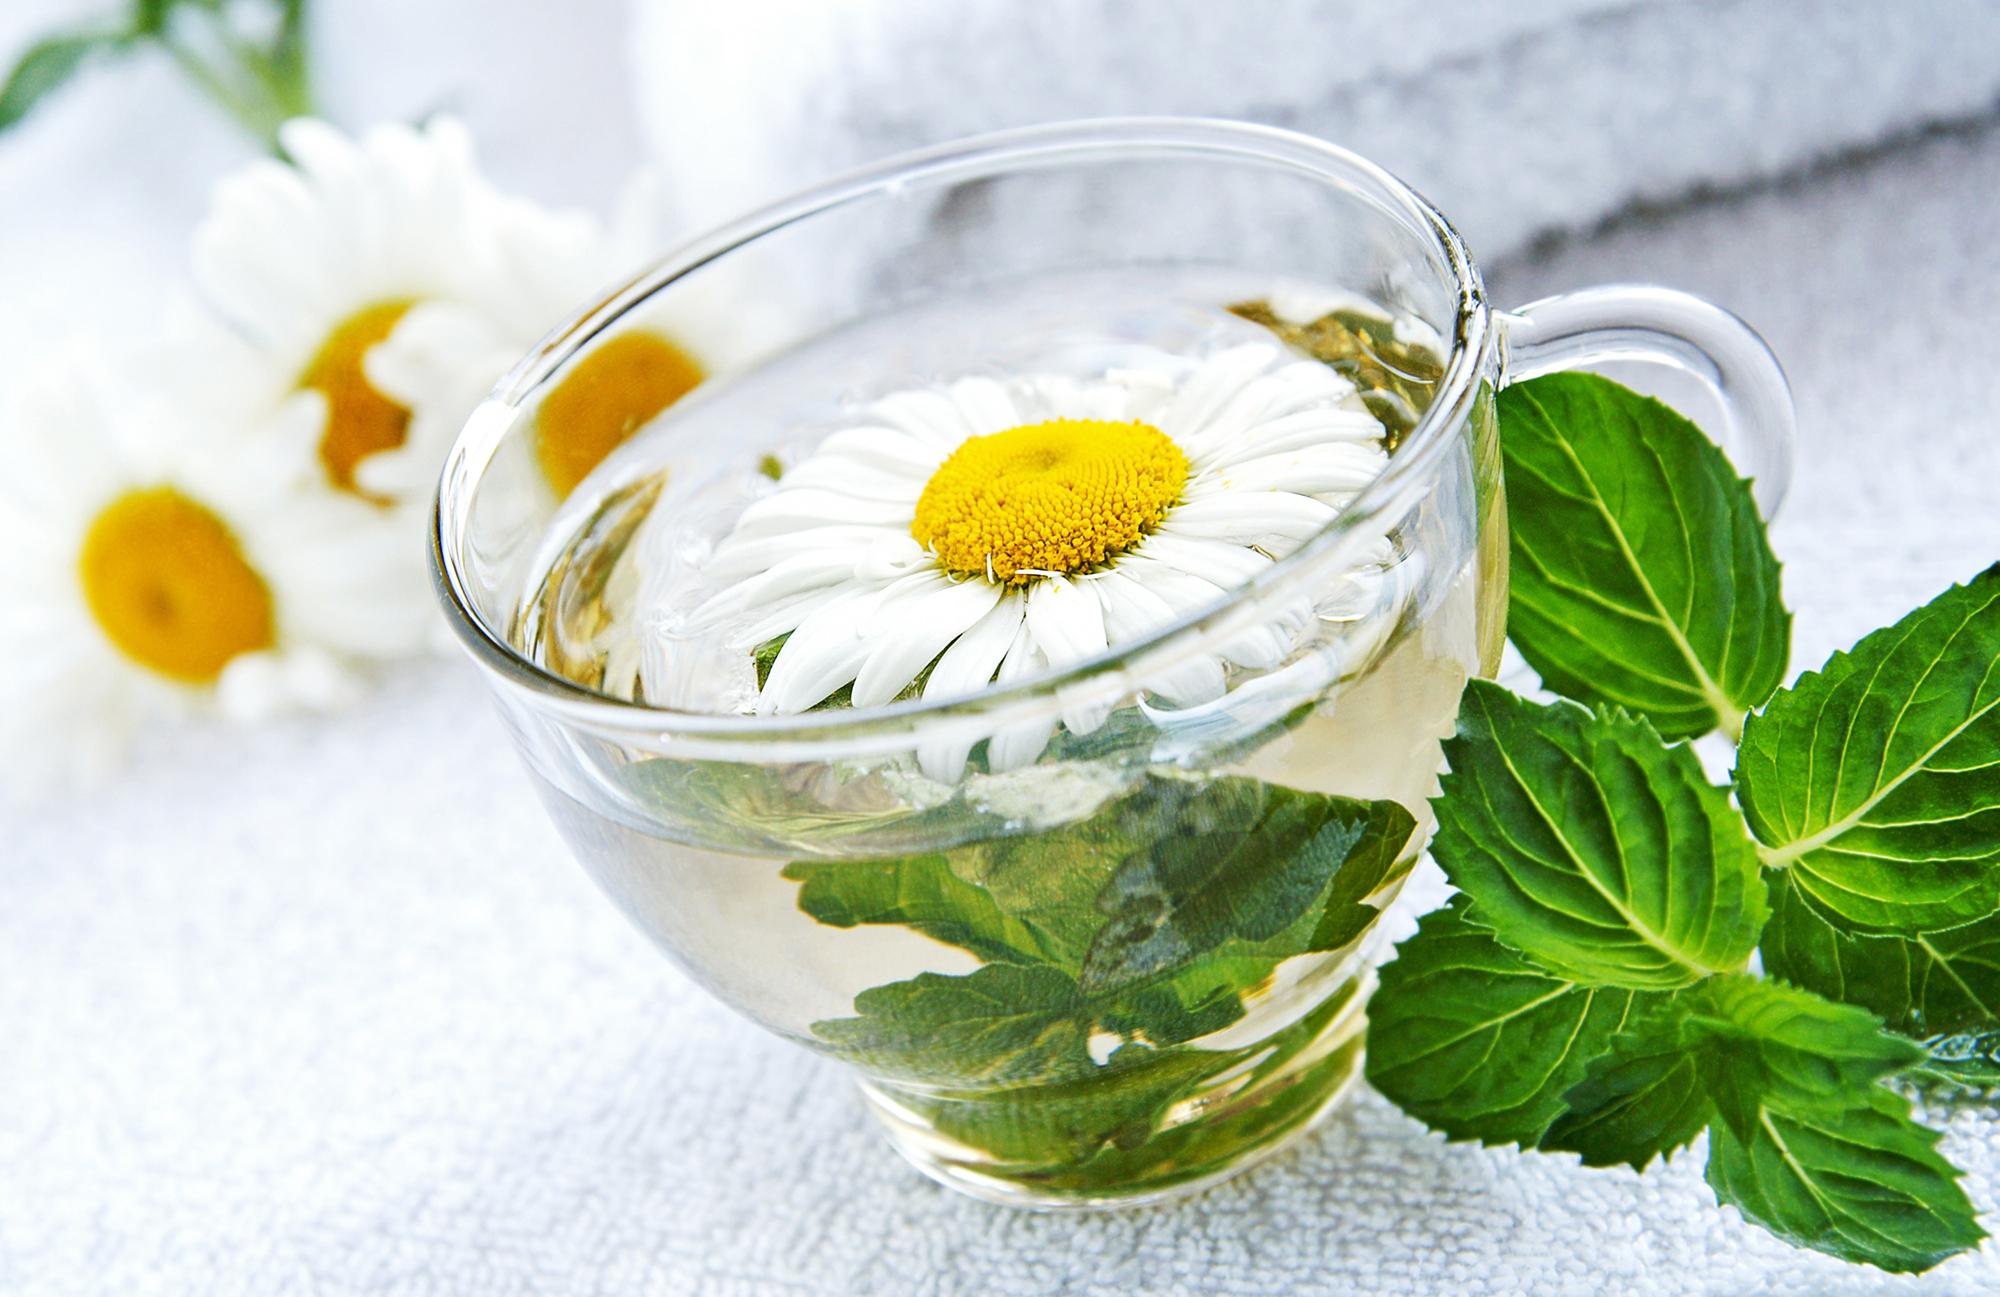 5 motive pentru a consuma ceai fierbinte vara